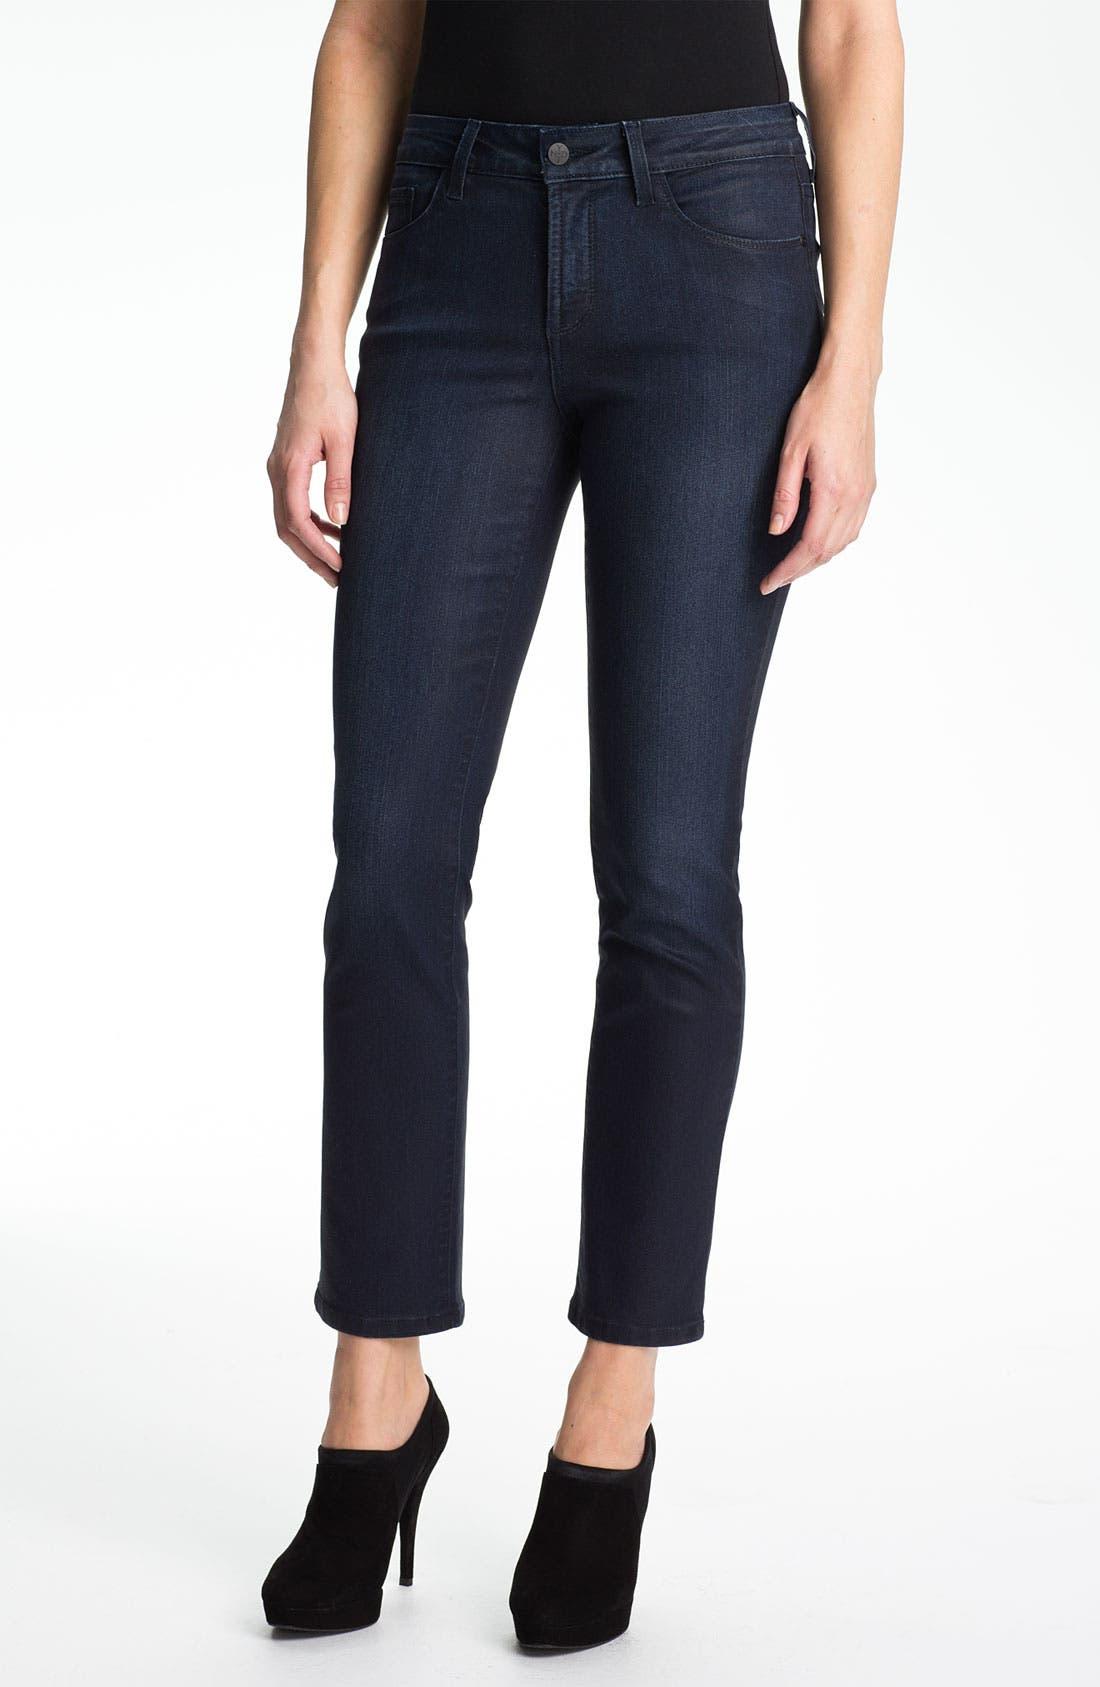 Main Image - NYDJ 'Sheri' Skinny Jeans (Petite)